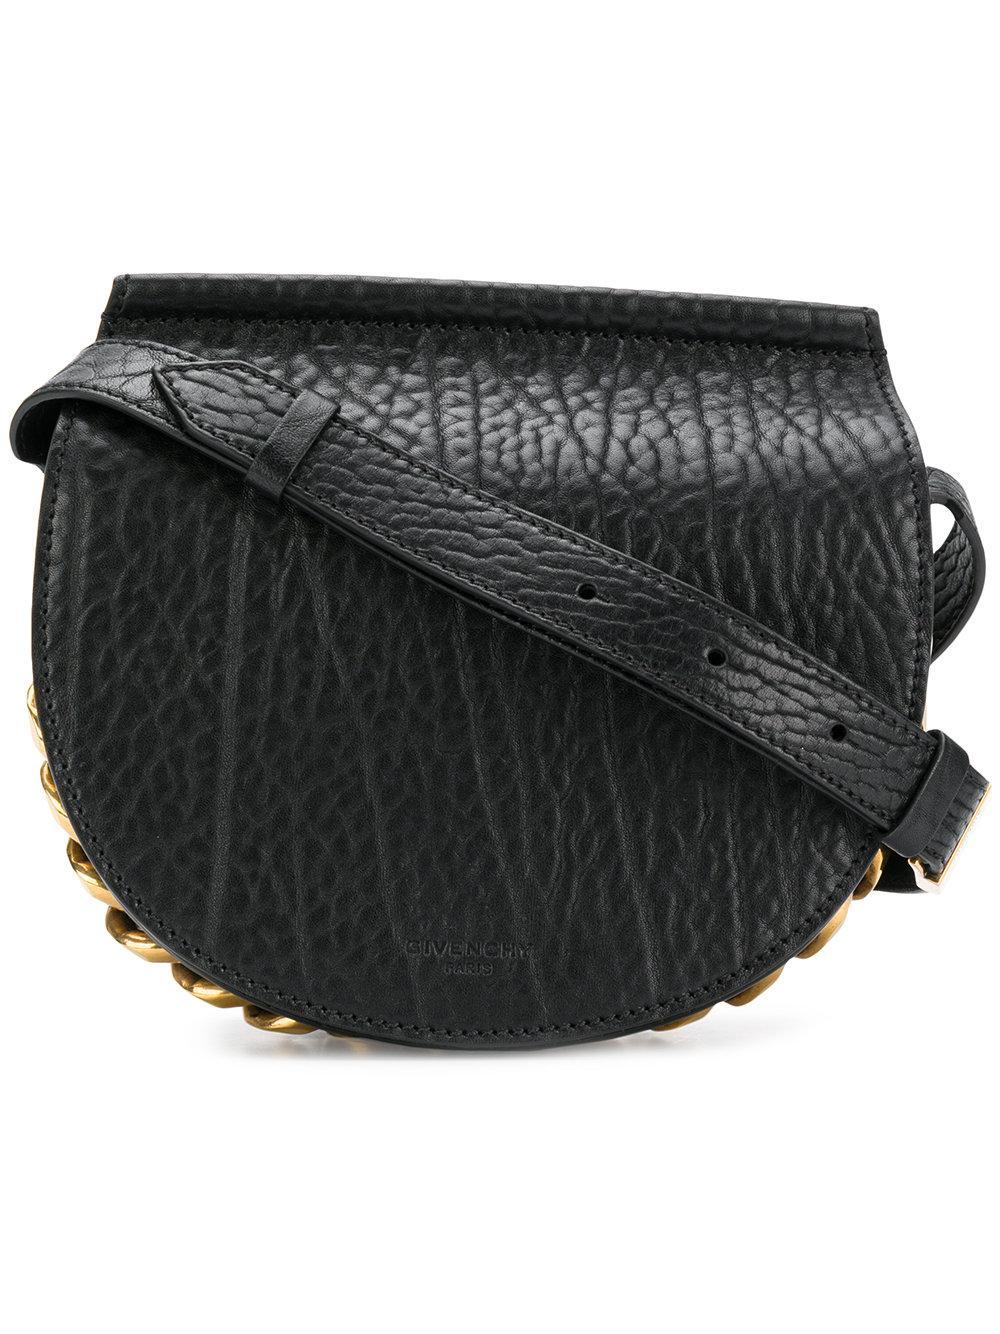 Givenchy Infinity Calfskin Leather Saddle Bag - Black